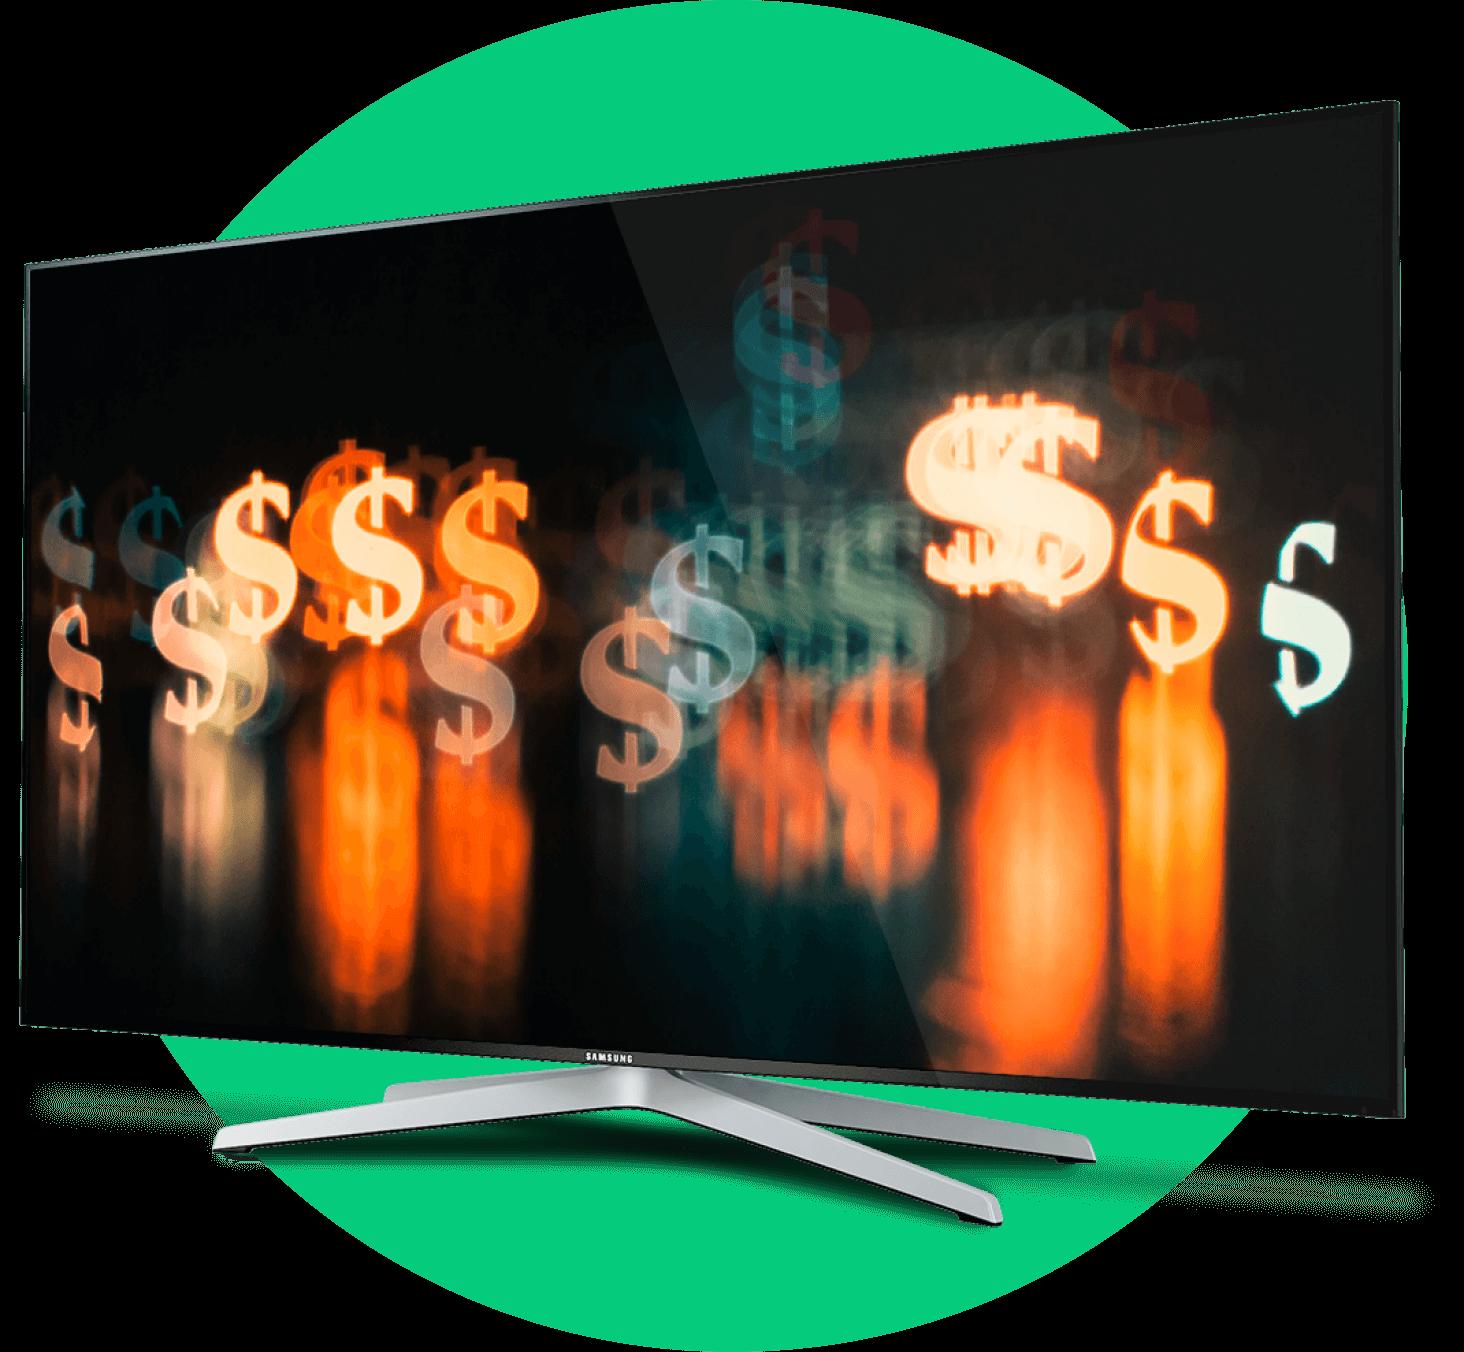 TV dollars